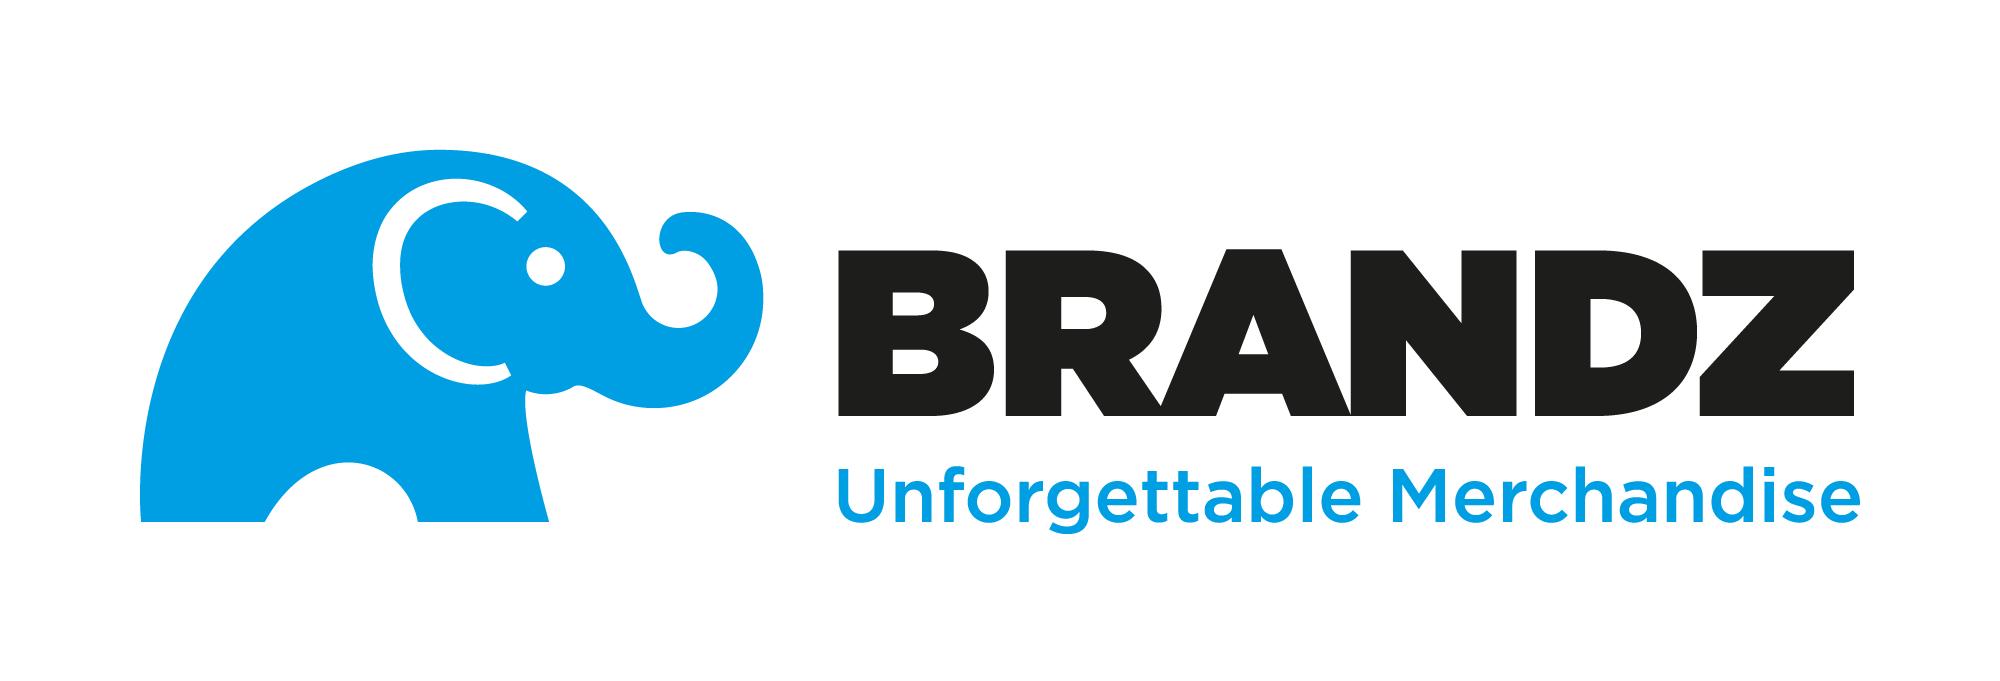 Brandz logo horizontal blue